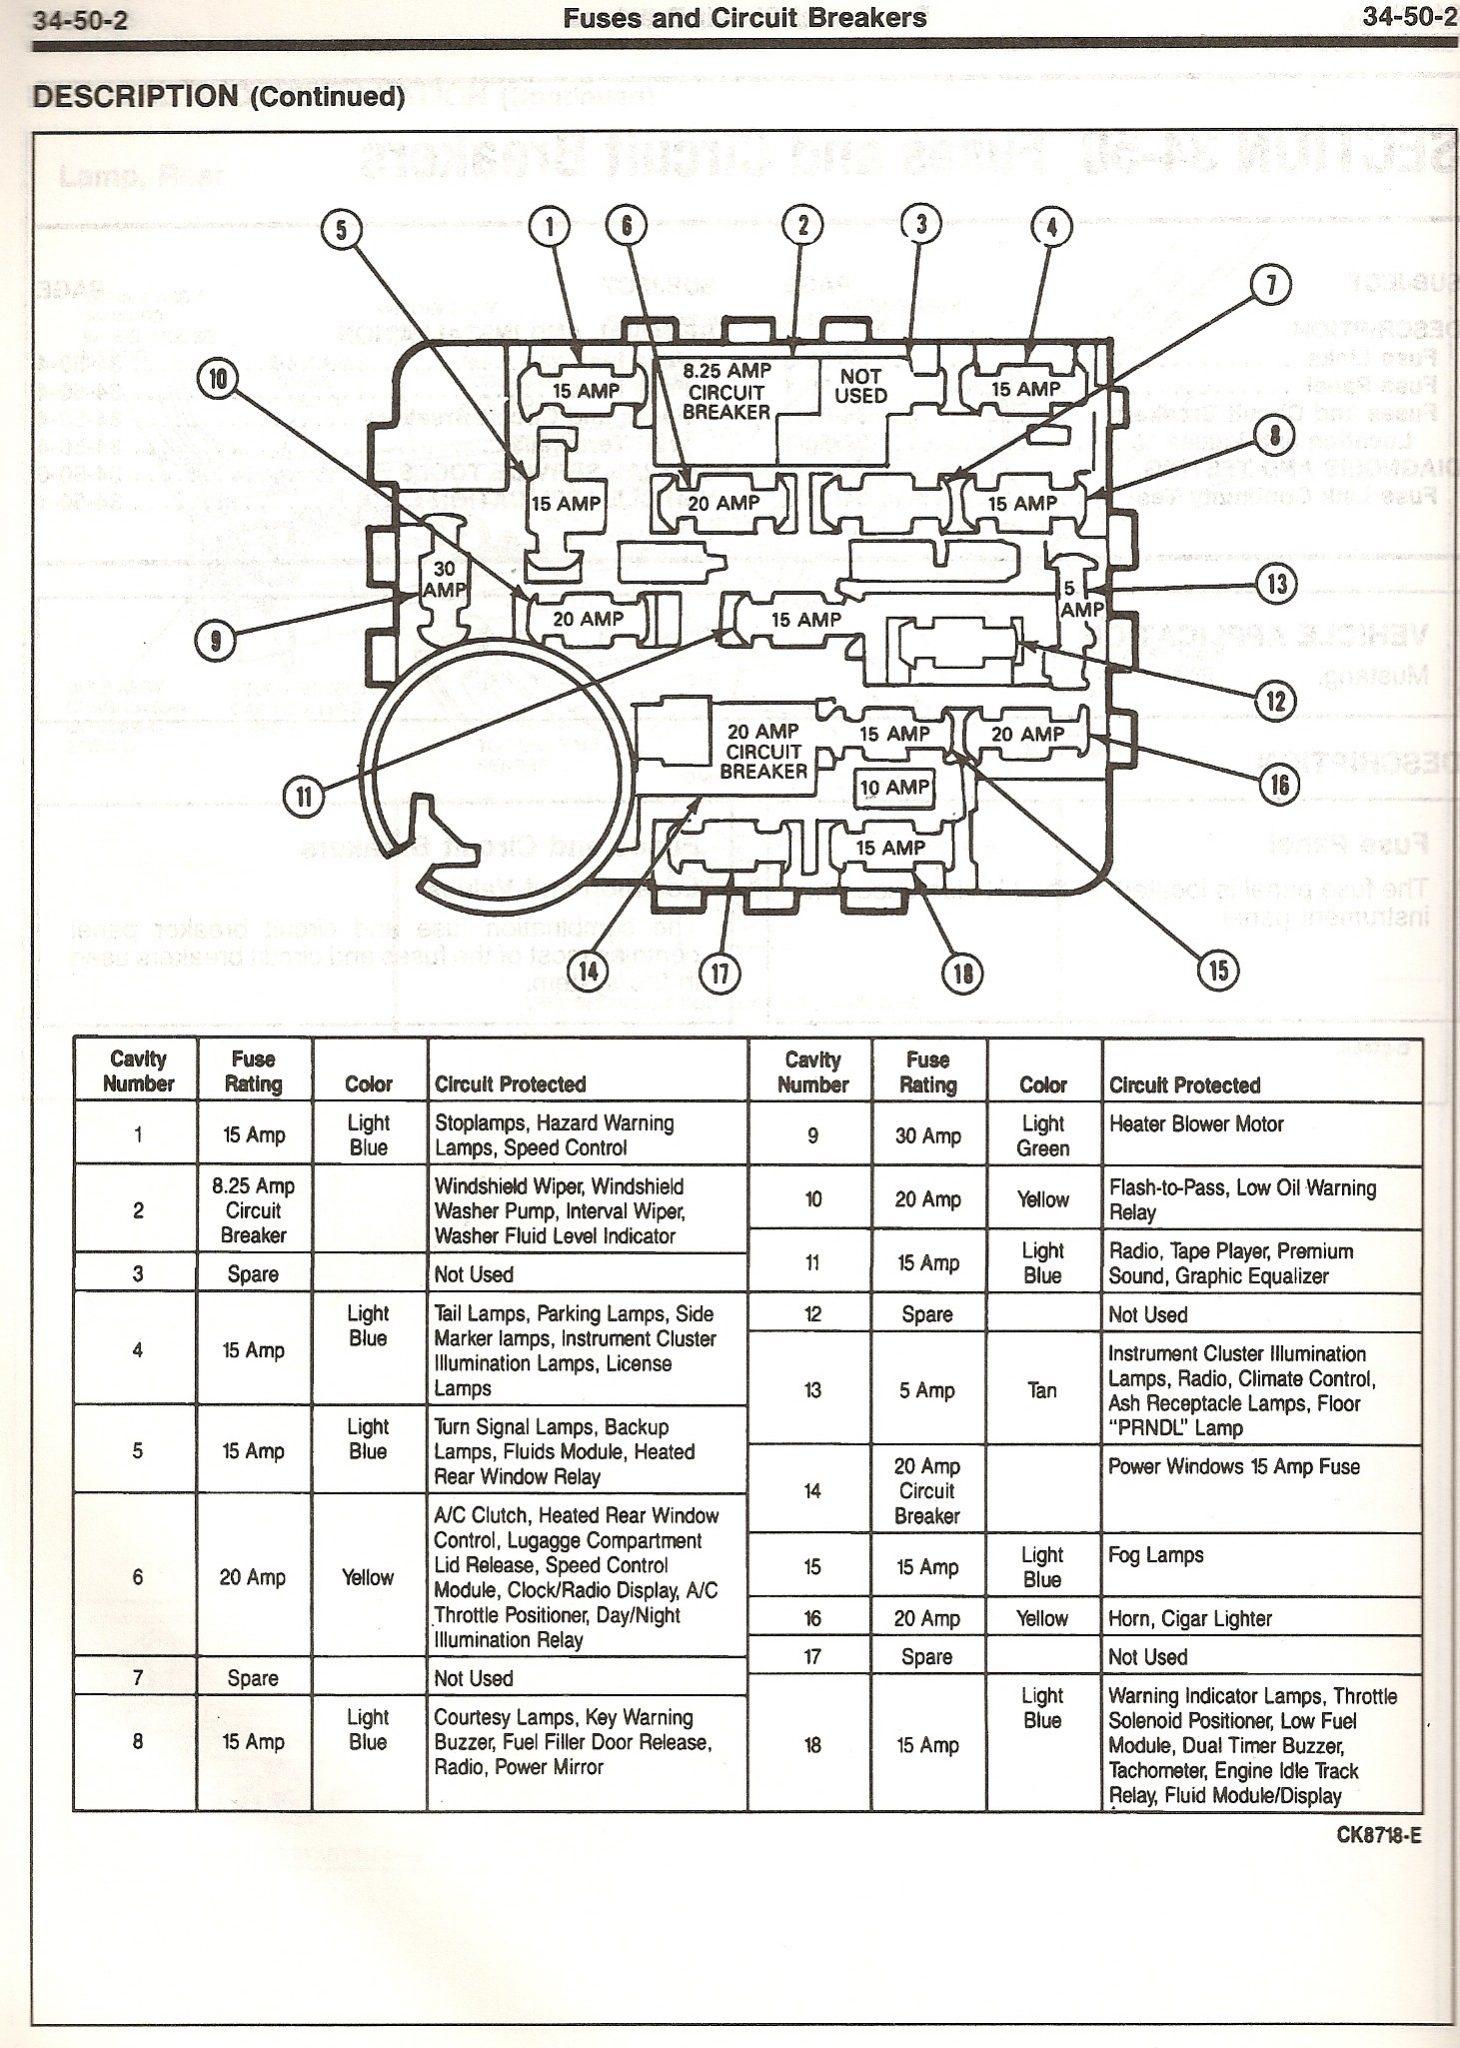 1964 mustang fuse box wiring 89 mustang fuse diagram wiring diagram data  mustang fuse diagram wiring diagram